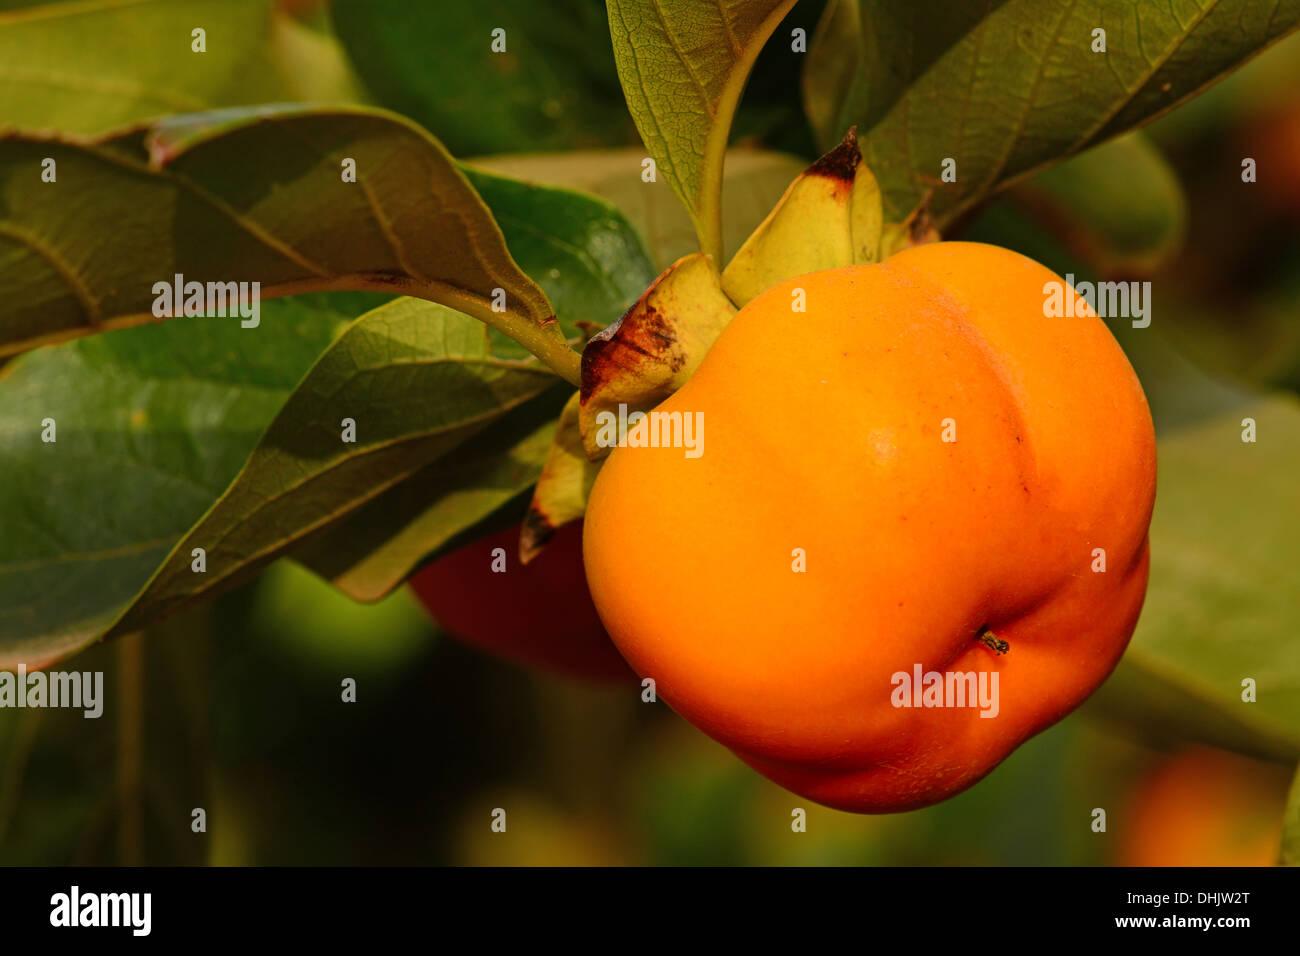 Persimmon, fruit on tree - Stock Image